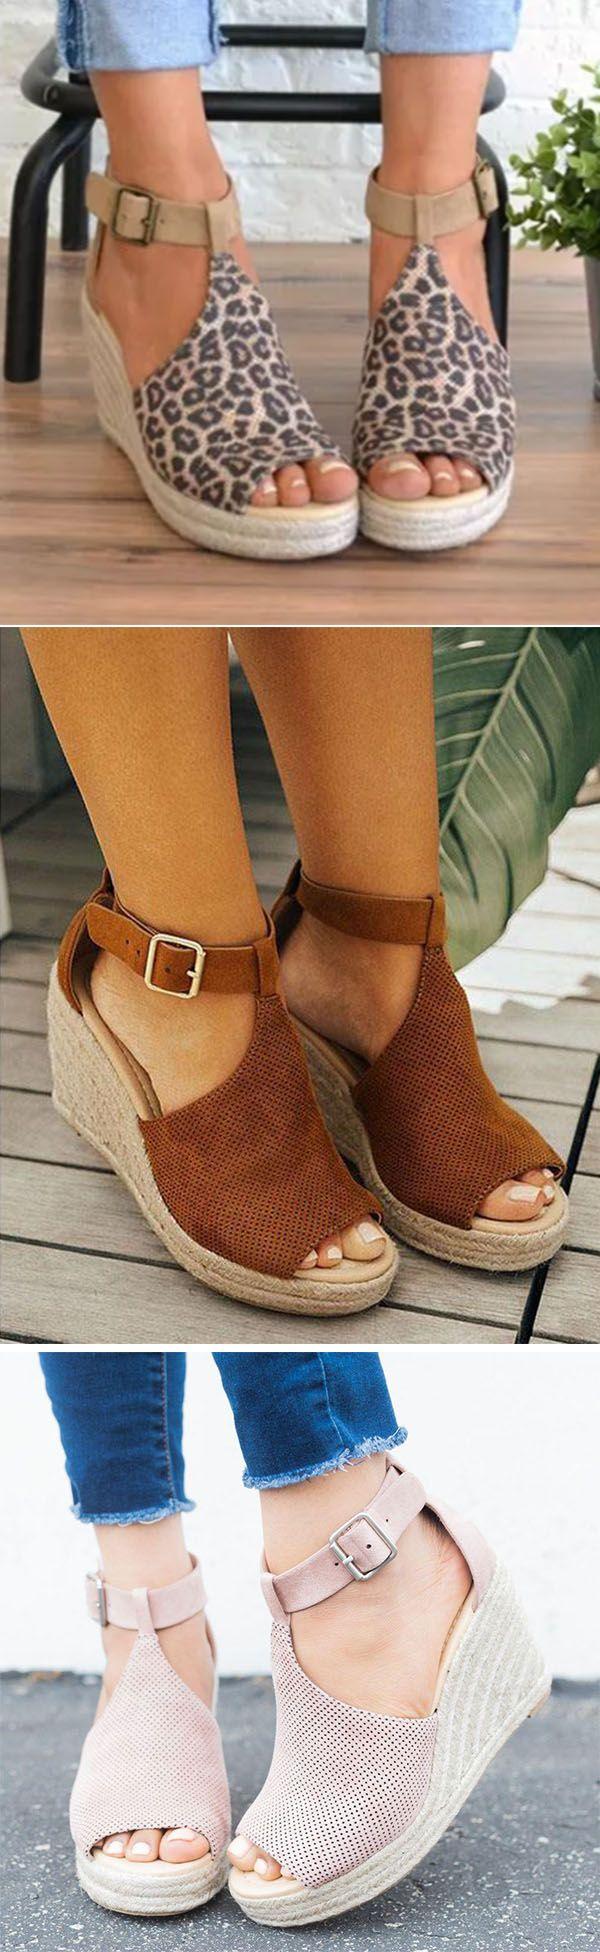 Women Chic Espadrille Wedges Adjustable Buckle Sandals -6964